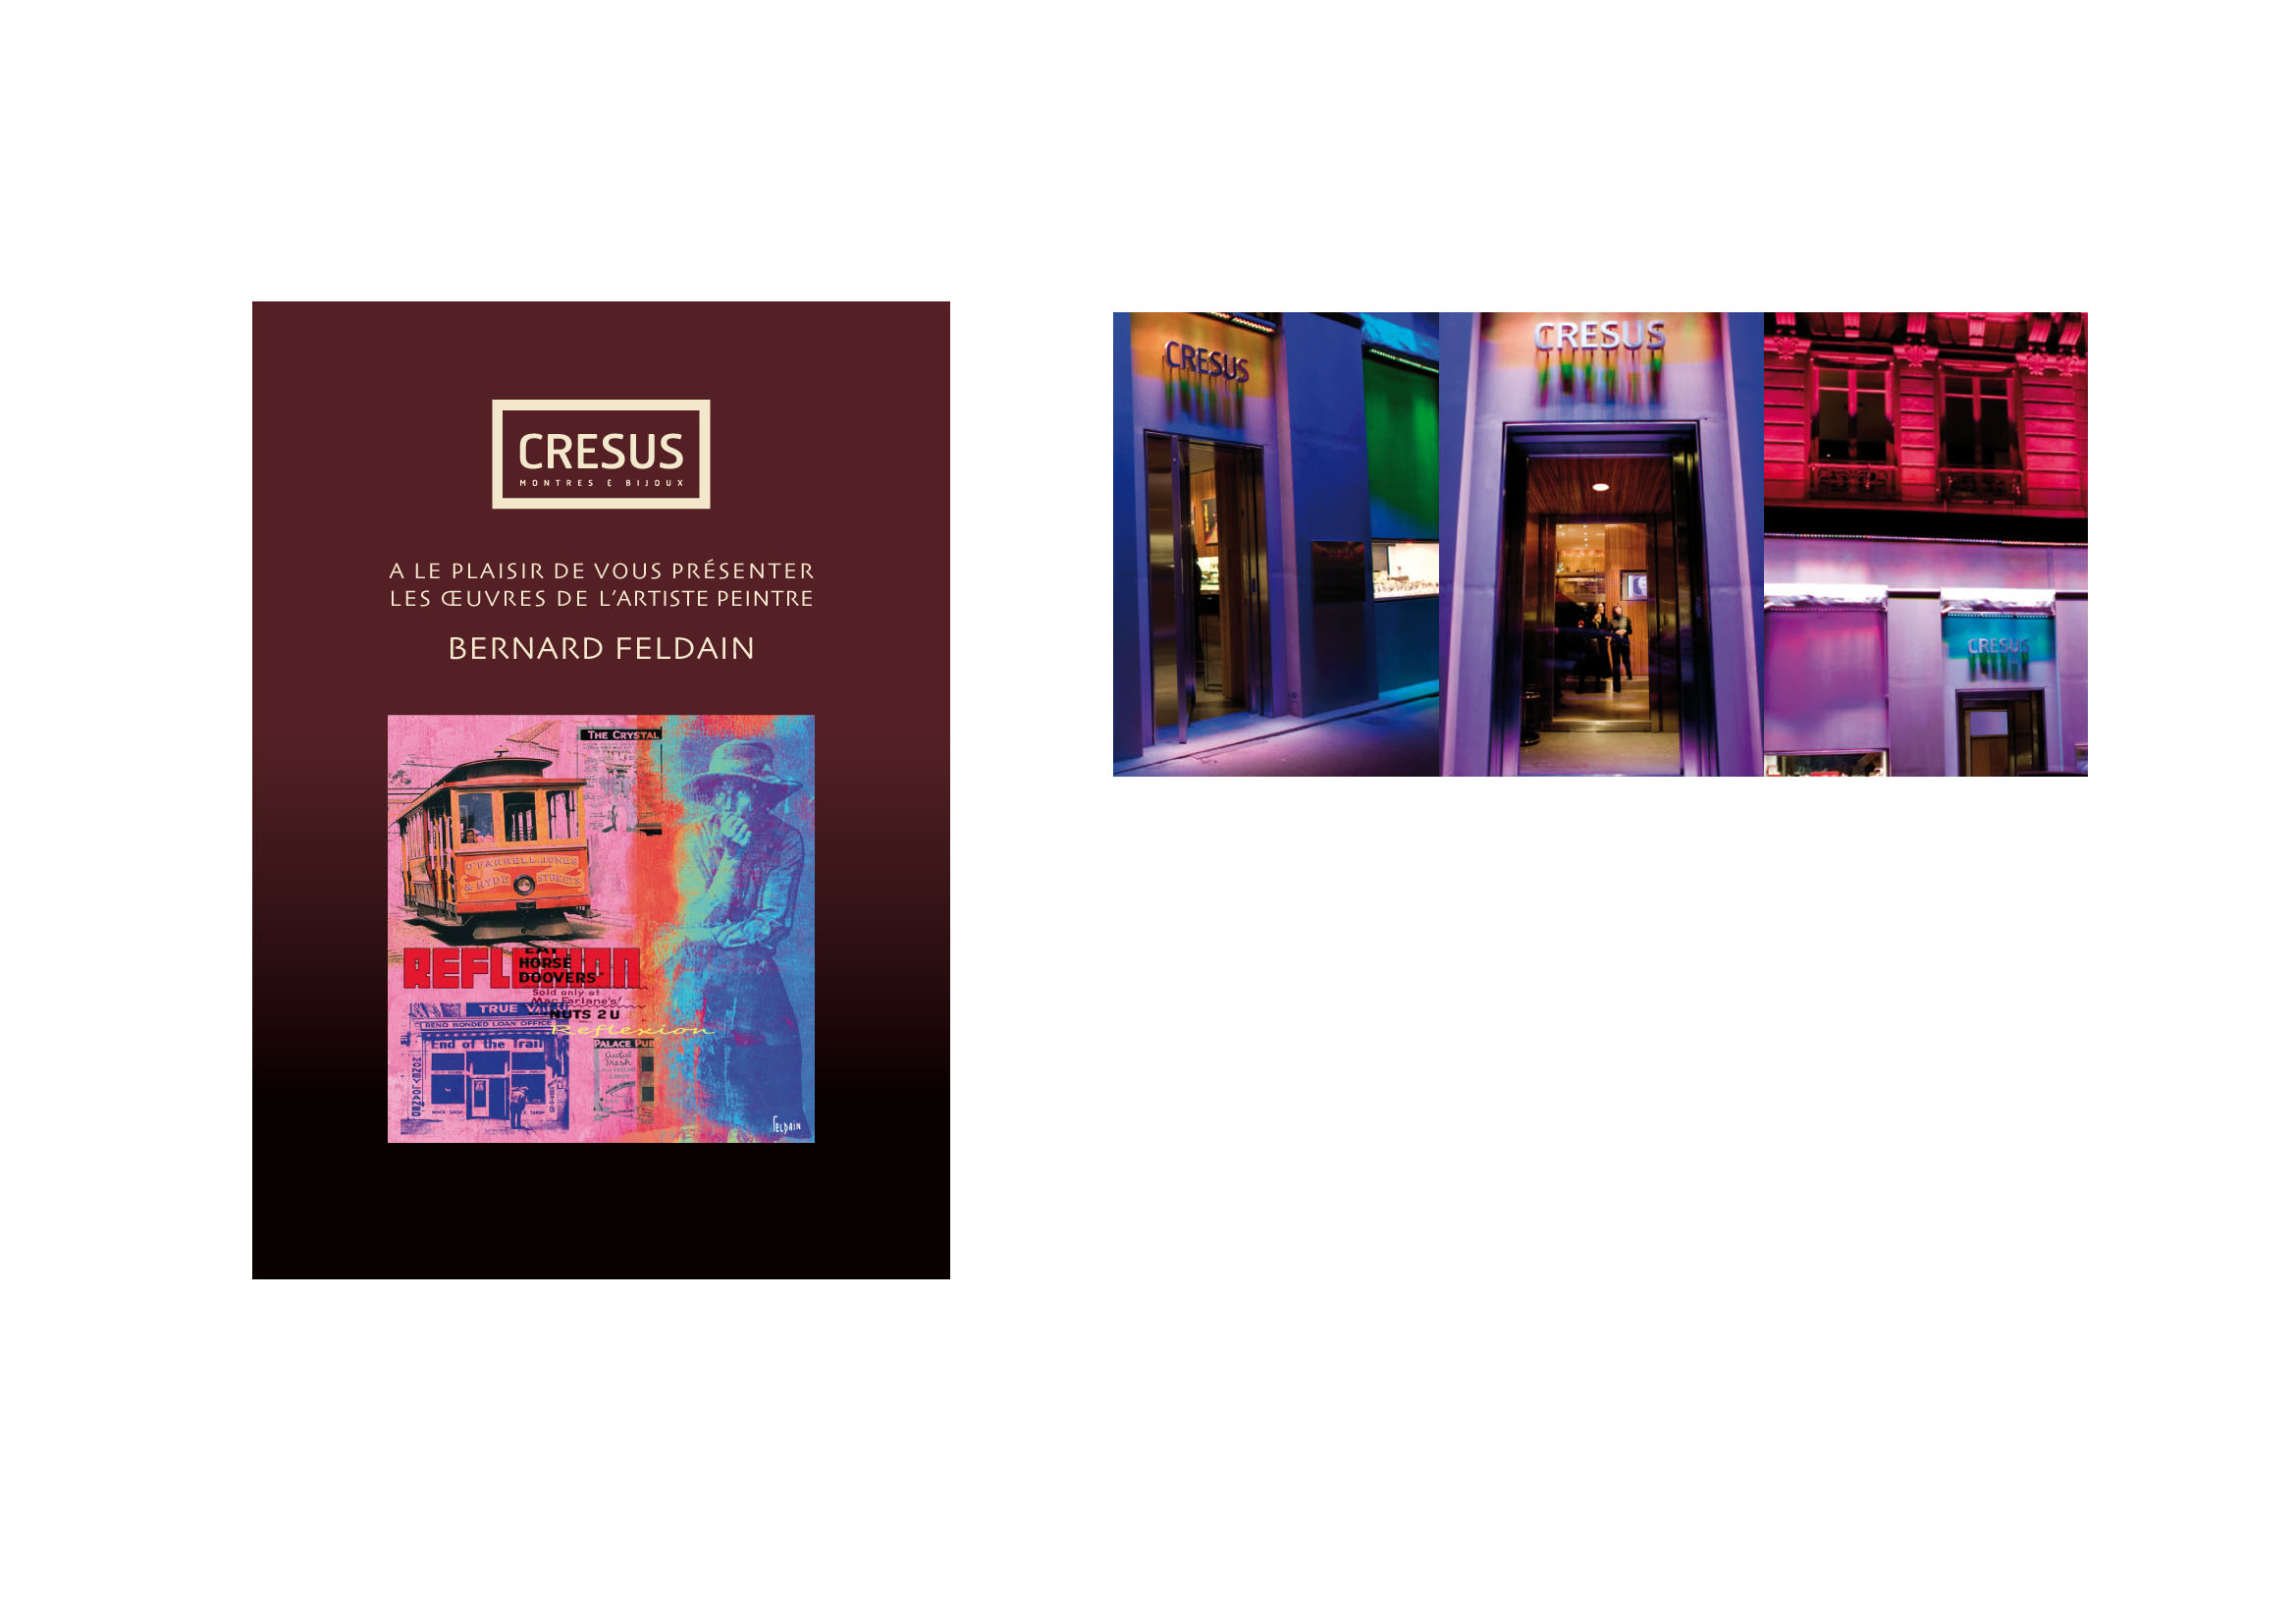 Site Des Artistes Peintres index of /clients/ site virginie2/ok/mailing…